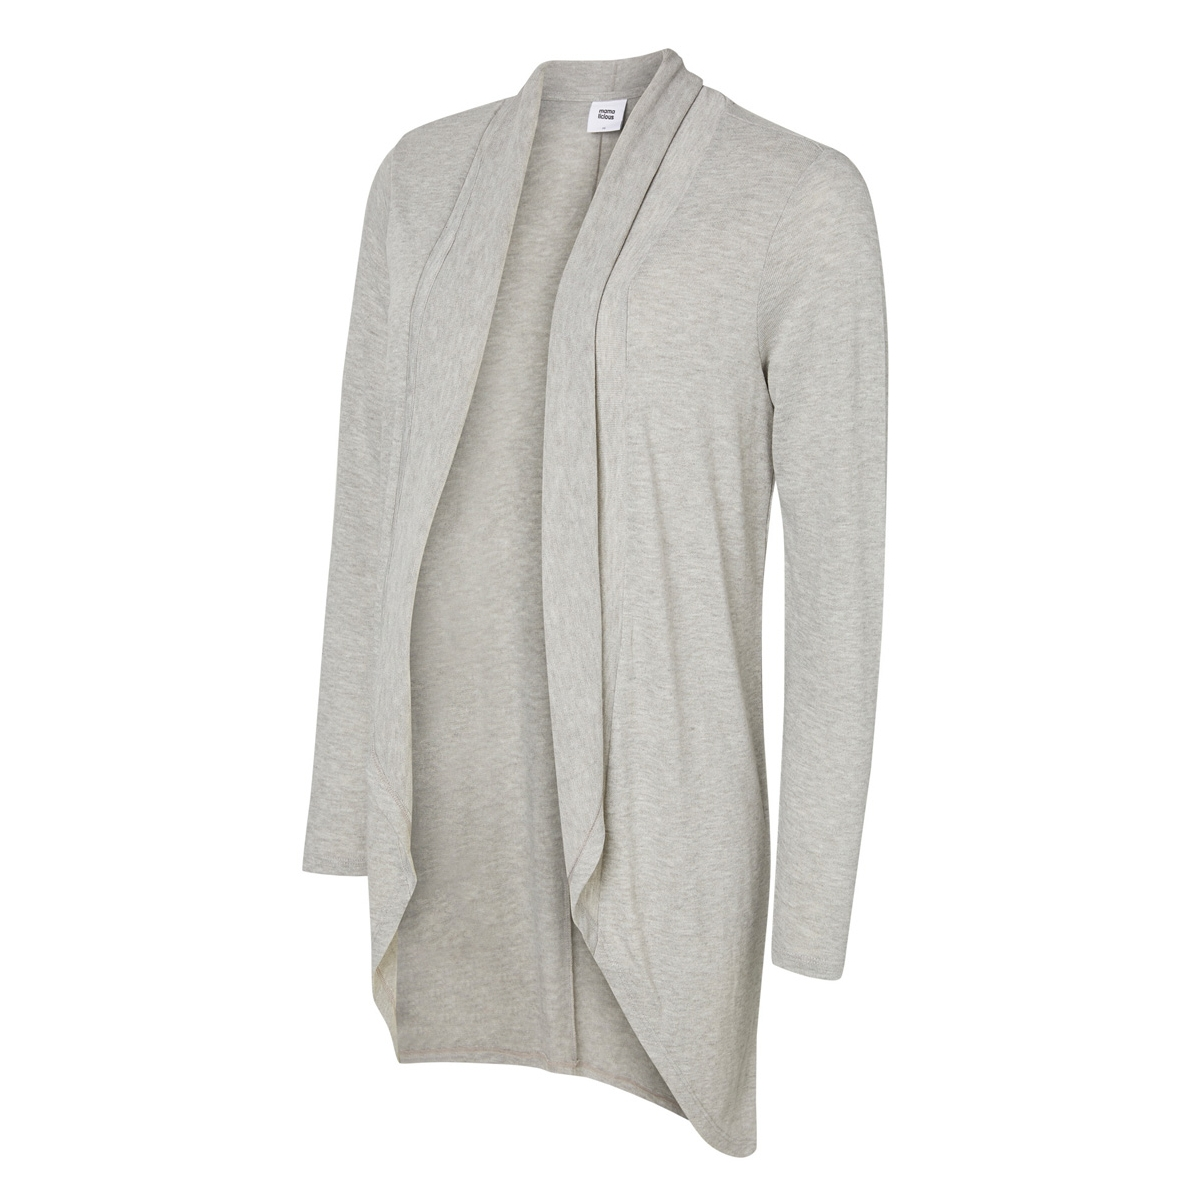 mlcharlot l/s knit cardigan 20003650 mama-licious positie vest light grey melange